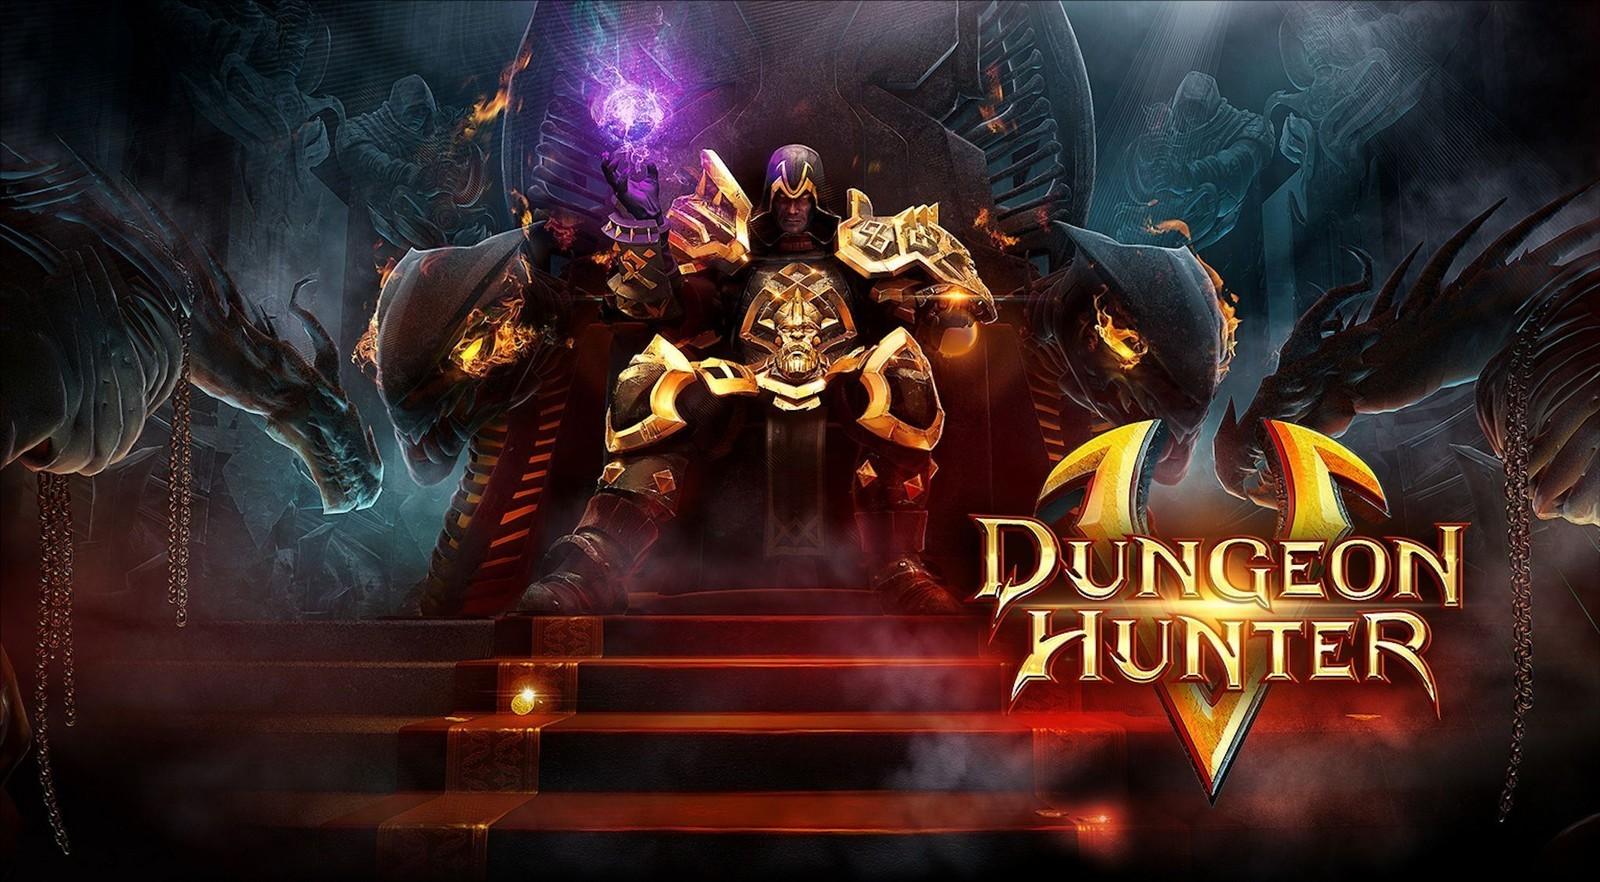 Game mobile Dungeon Hunter 5